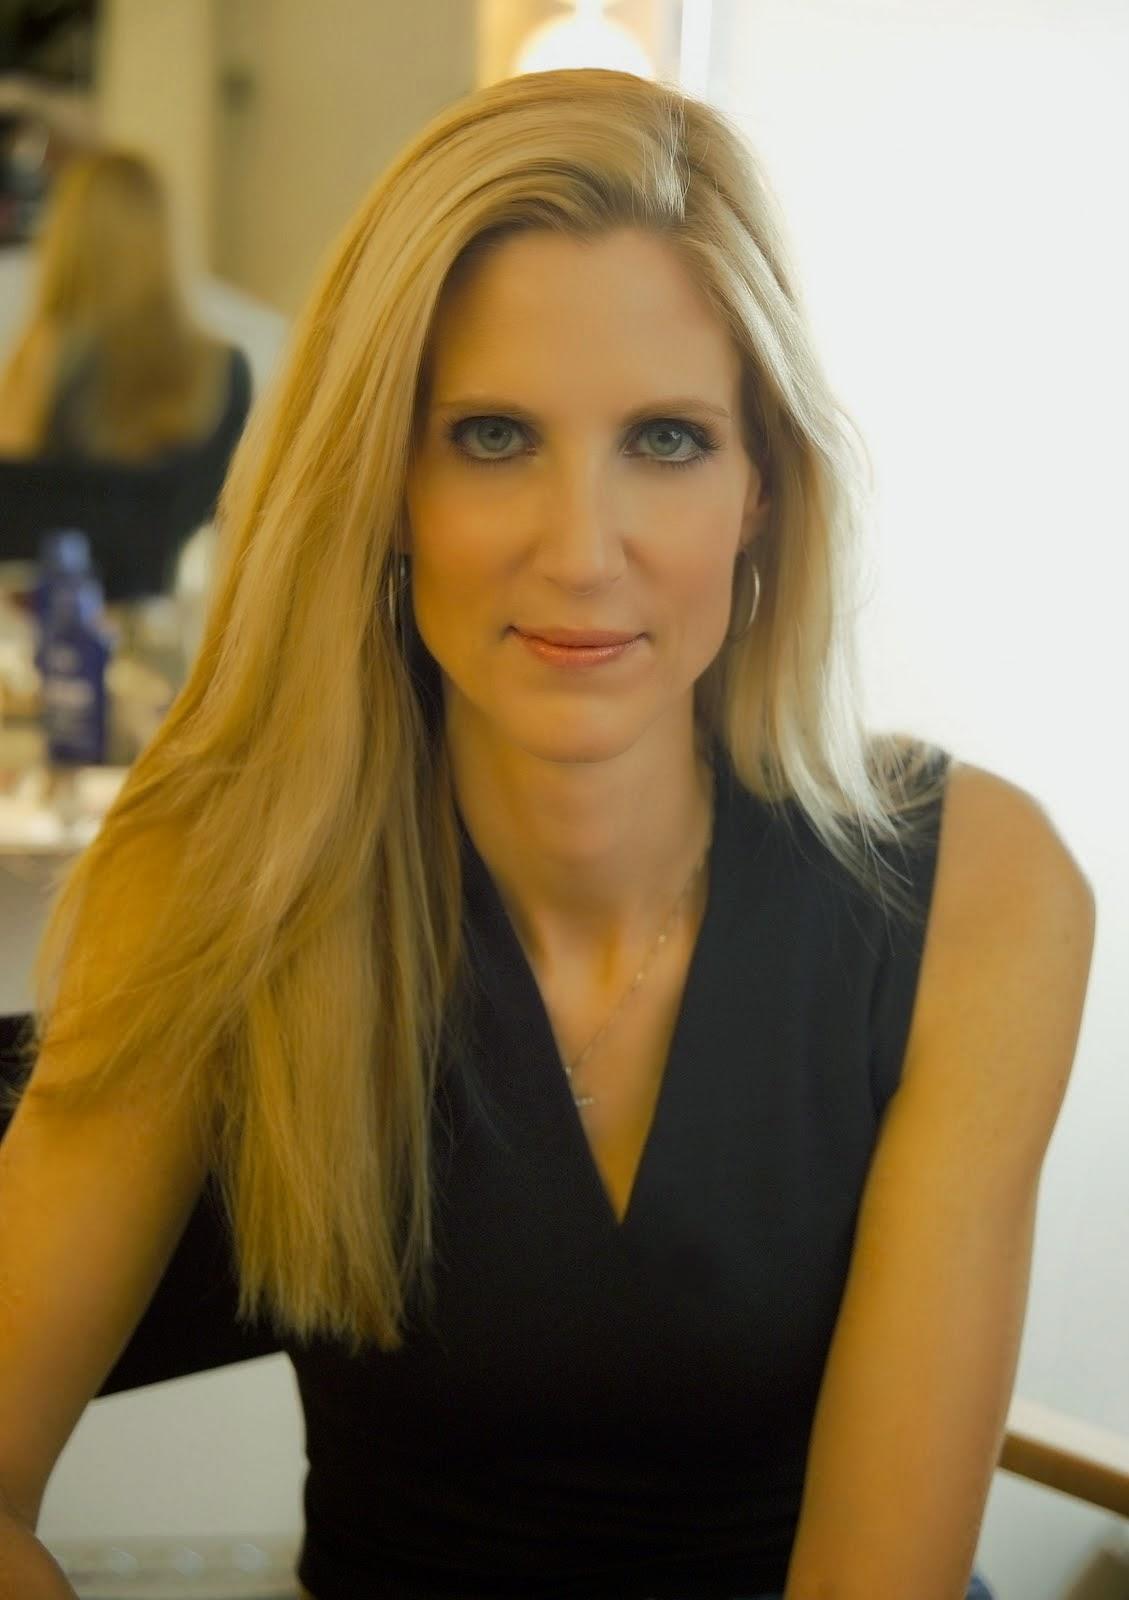 Image result for Ann Coulter blogspot.com